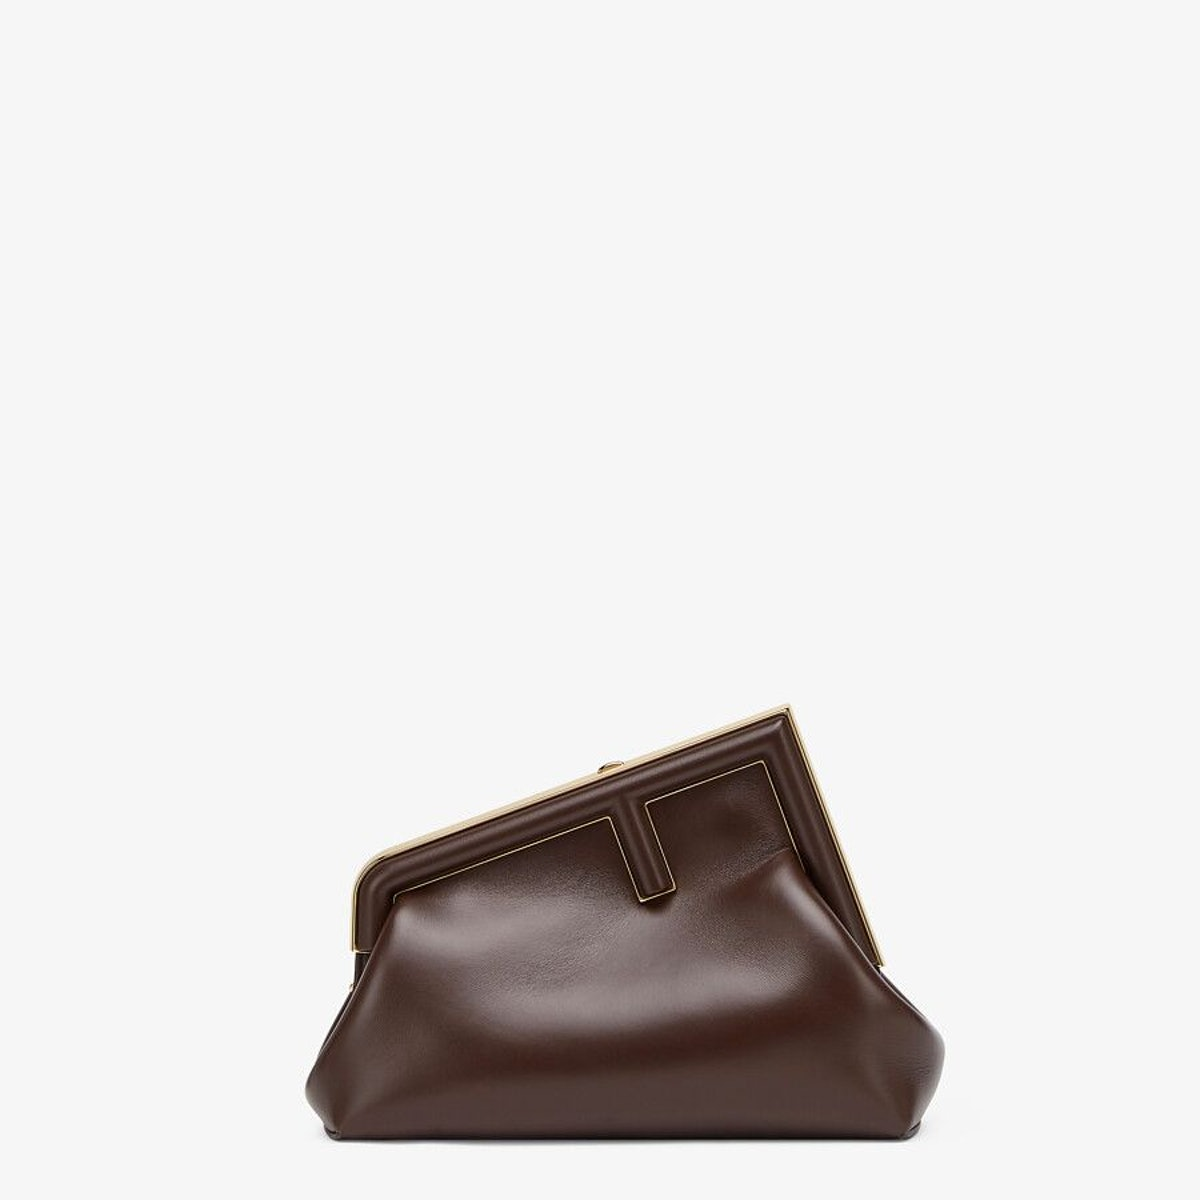 Fendi First Small Bag